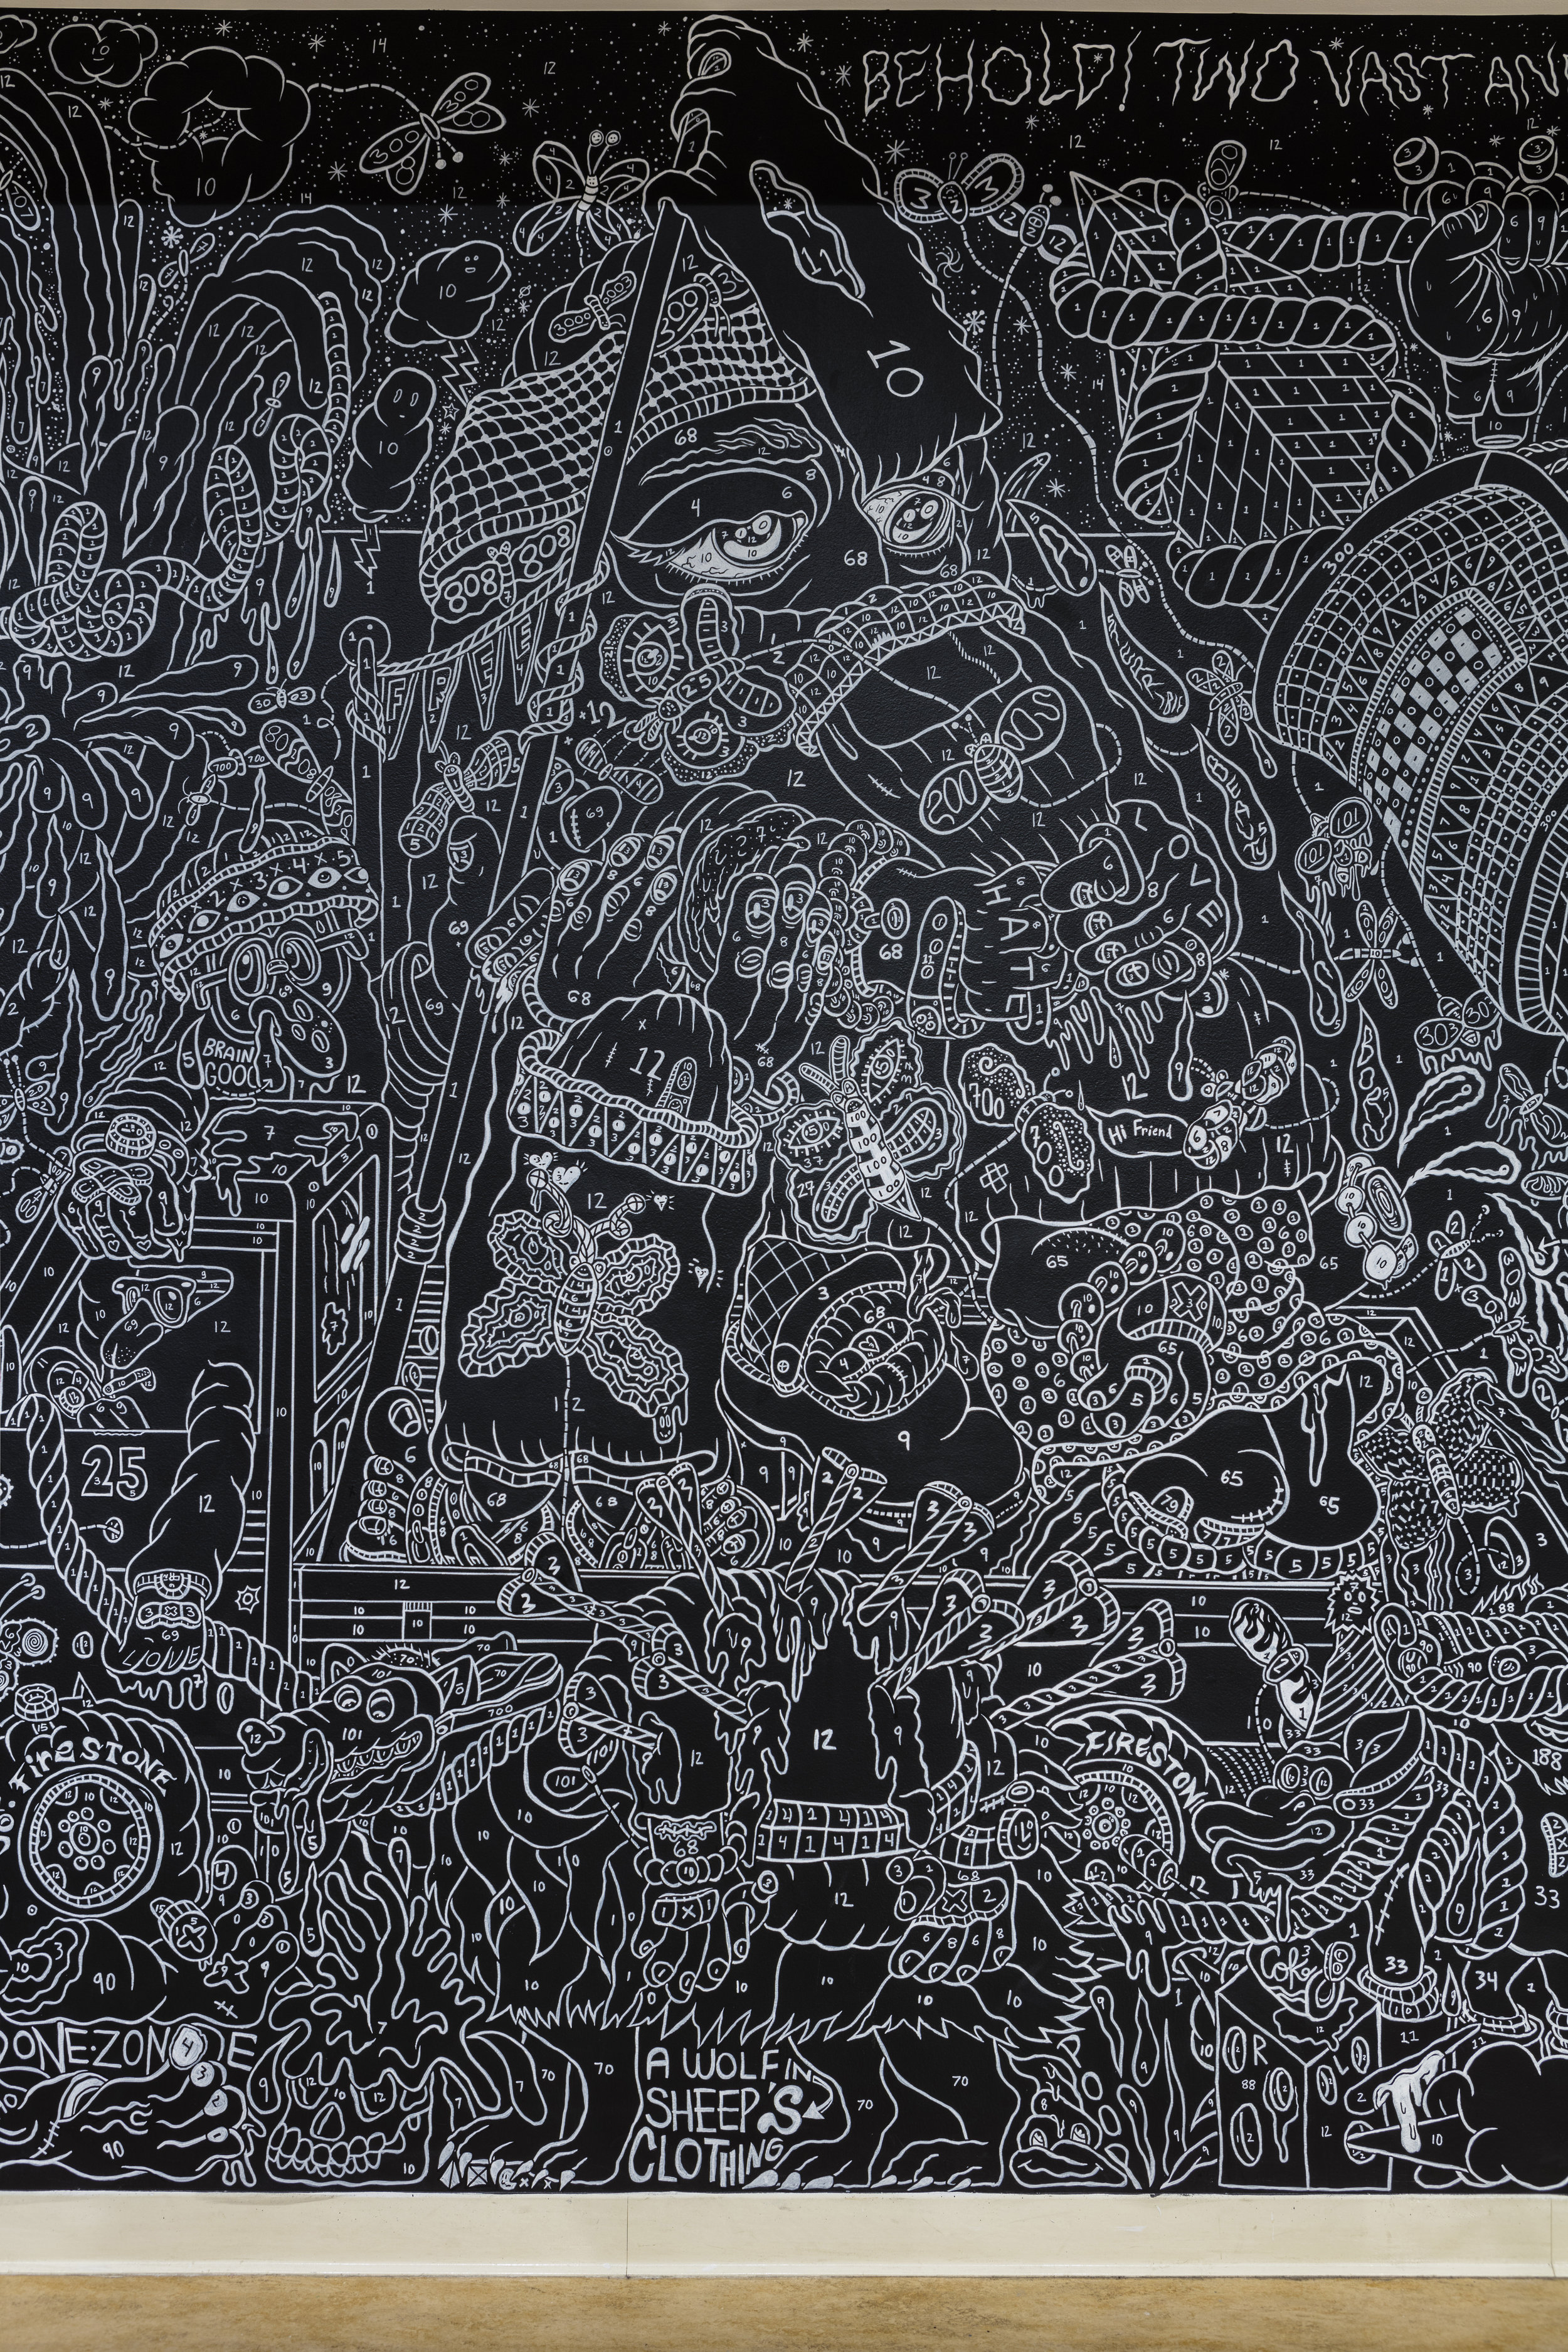 Help Me Make A Mural